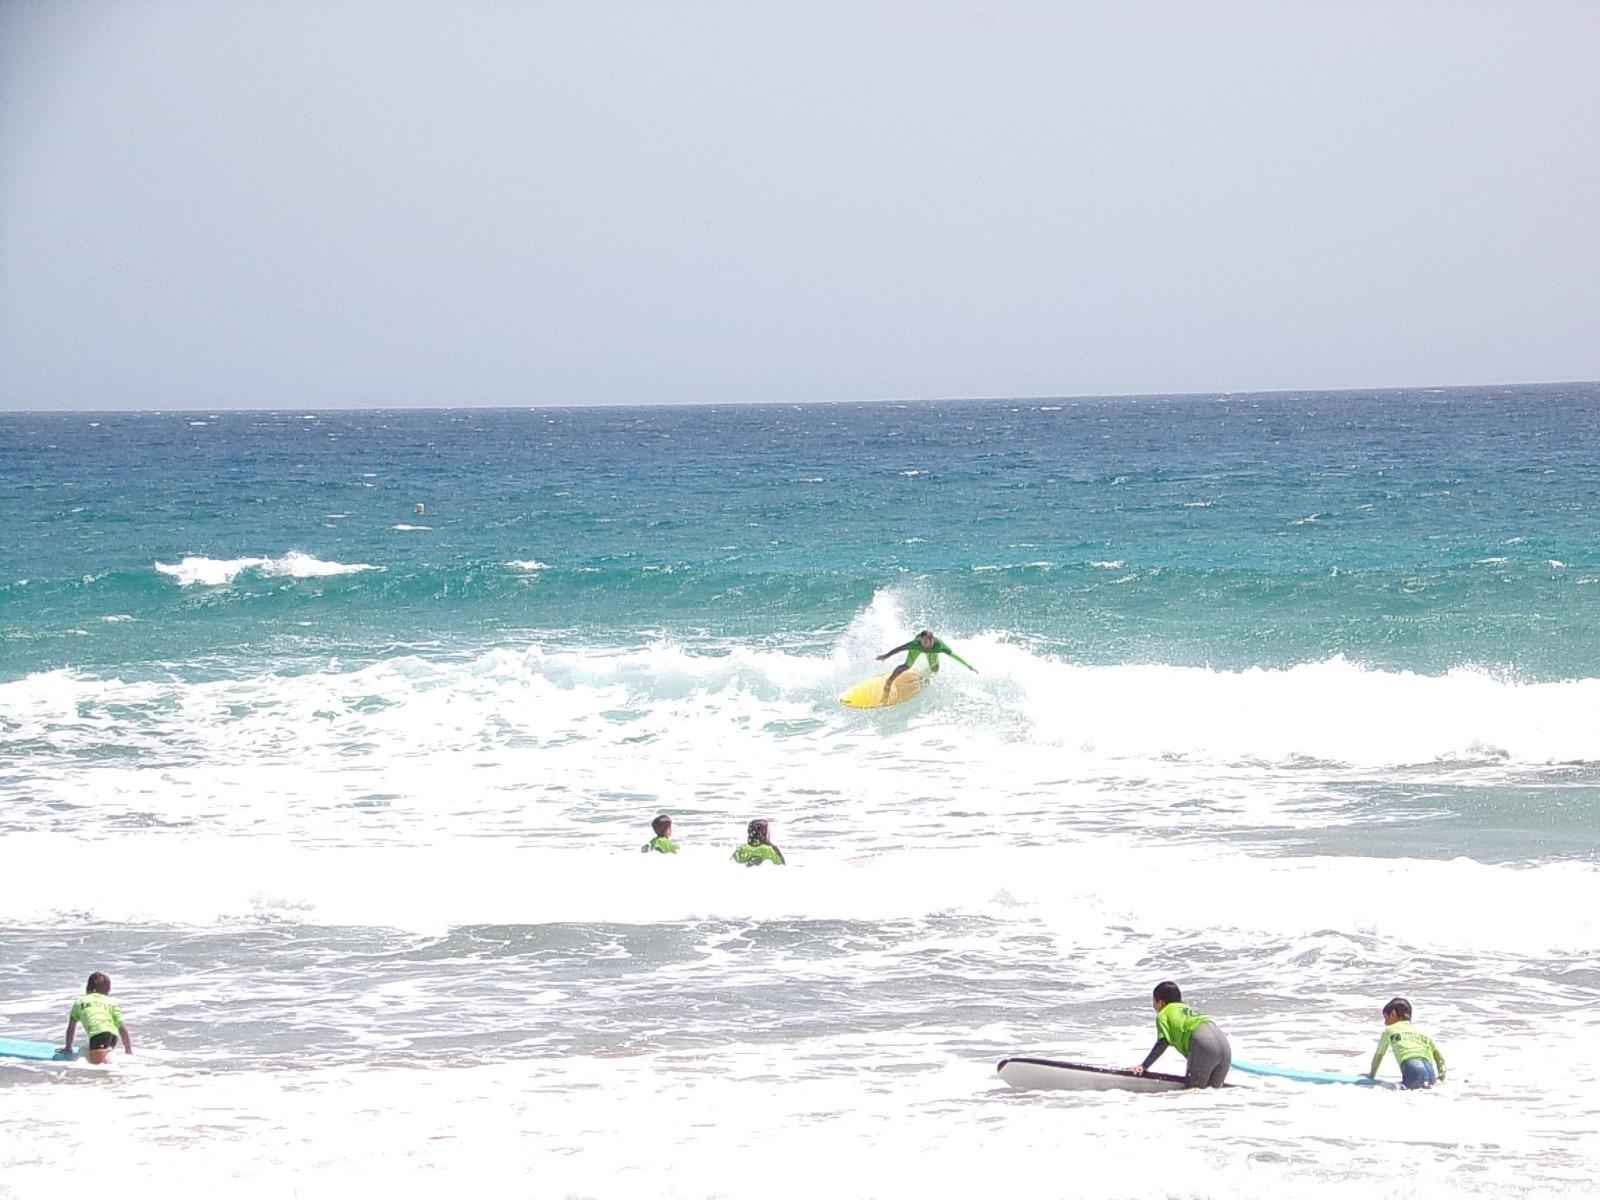 VERANO 2019 2 FUERTE TRIBU SURFWhatsApp Image 2019-08-15 at 15.48.16.jpeg